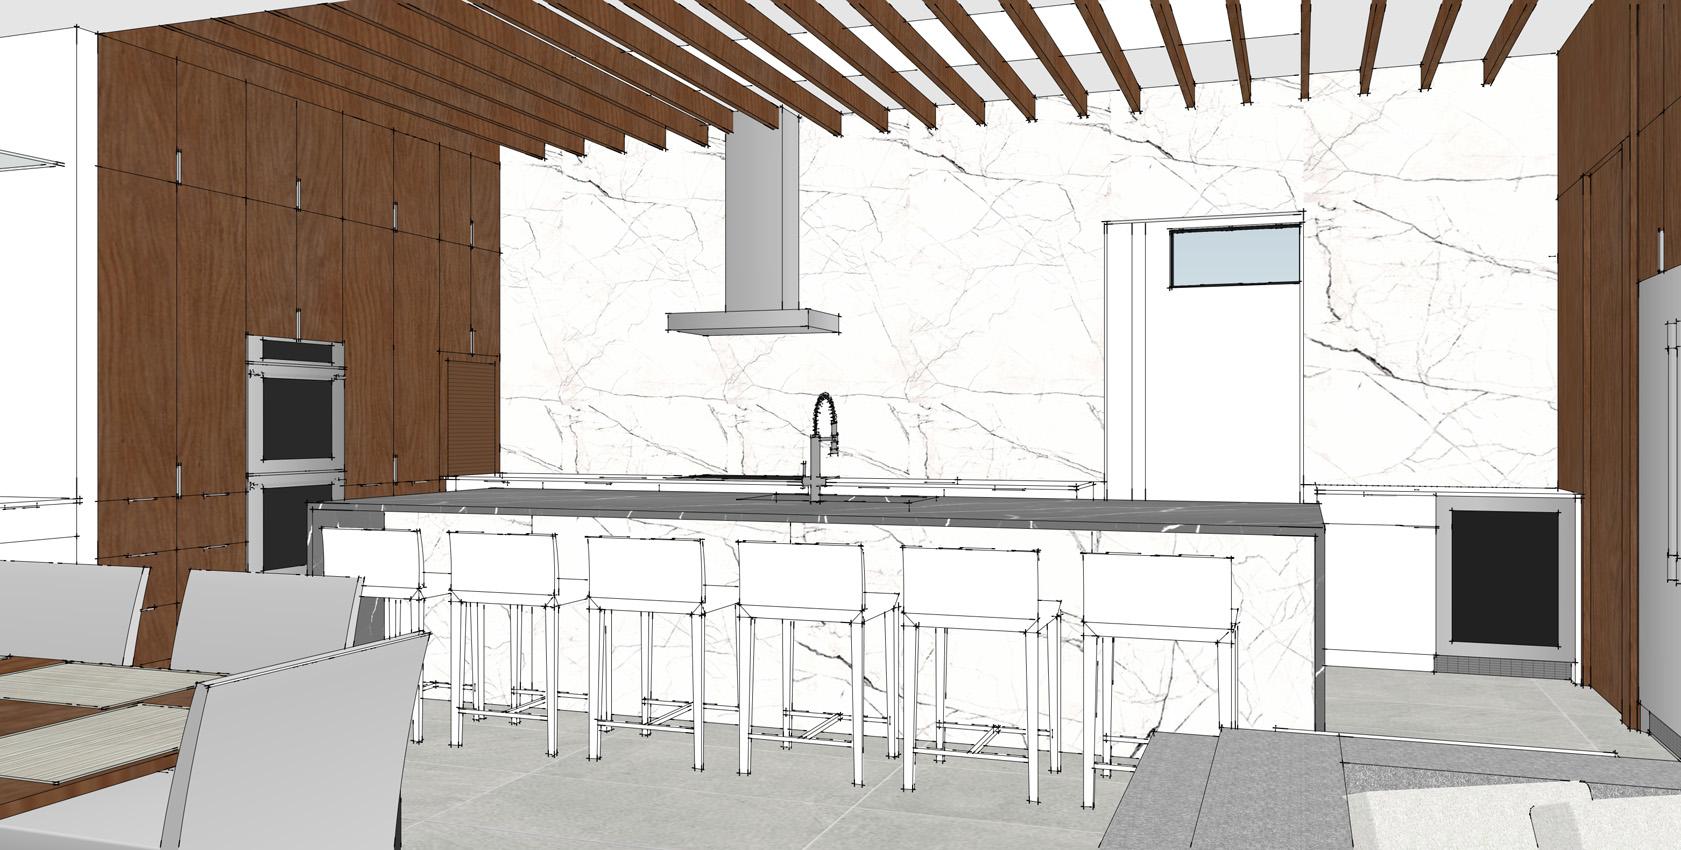 riverview_kitchen_rendering